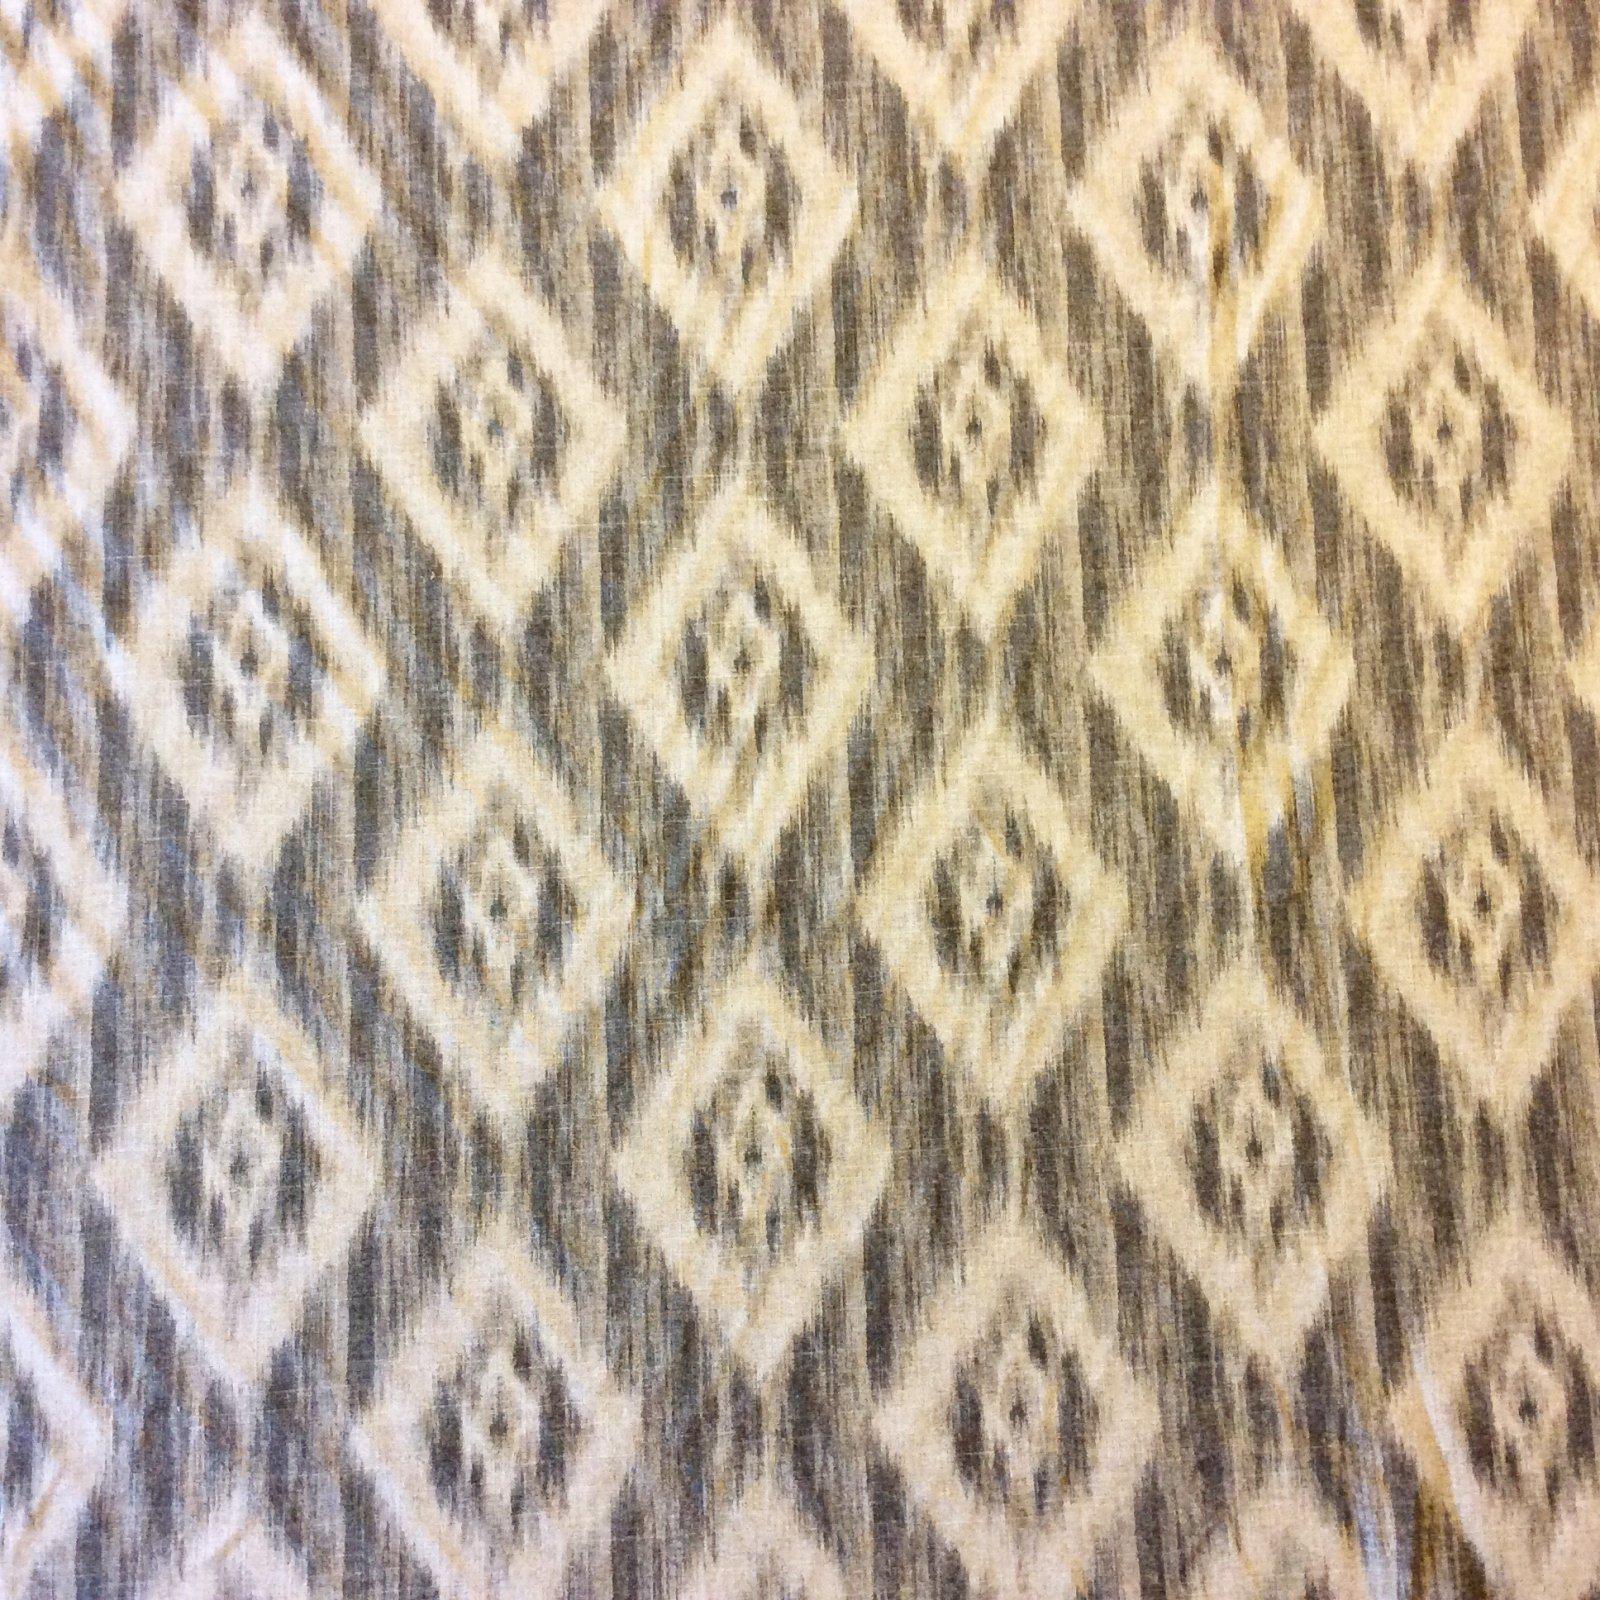 Neutral Ikat Diamond Geo Geometric Upholstery Drapery Home Decor Fabric NL070